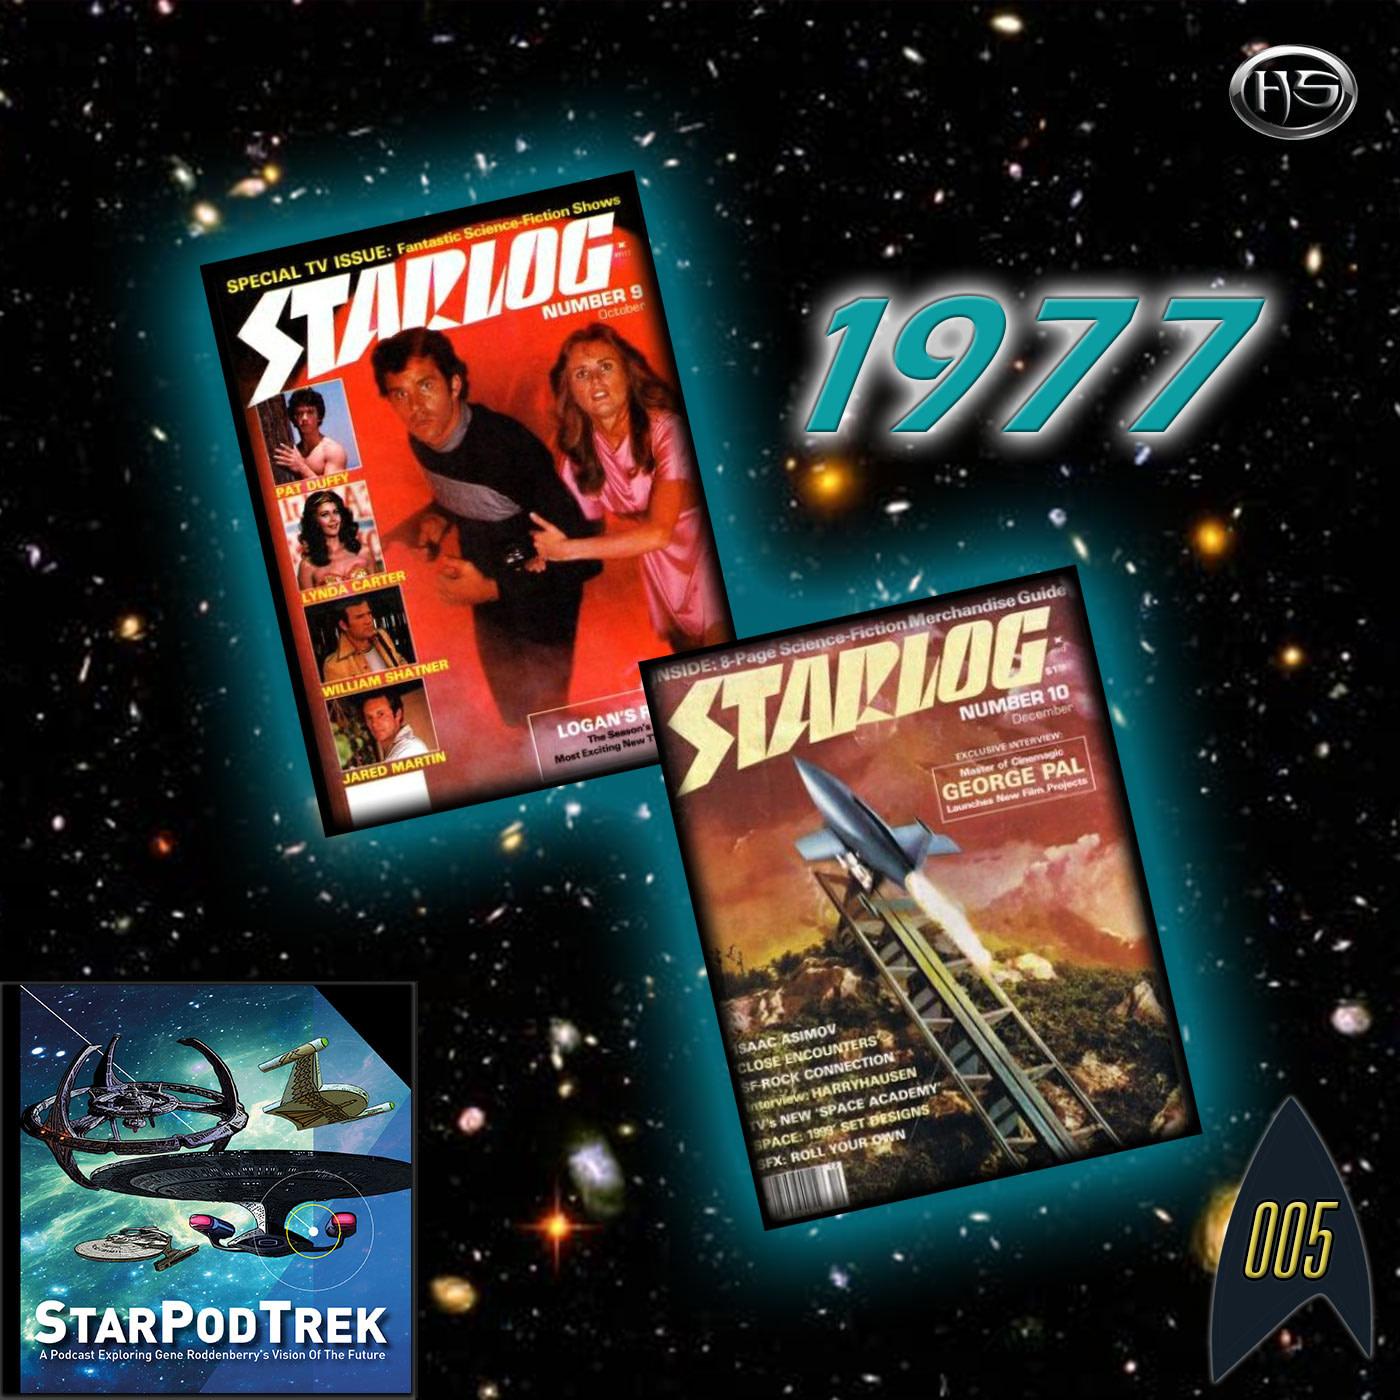 StarPodTrek Episode 5